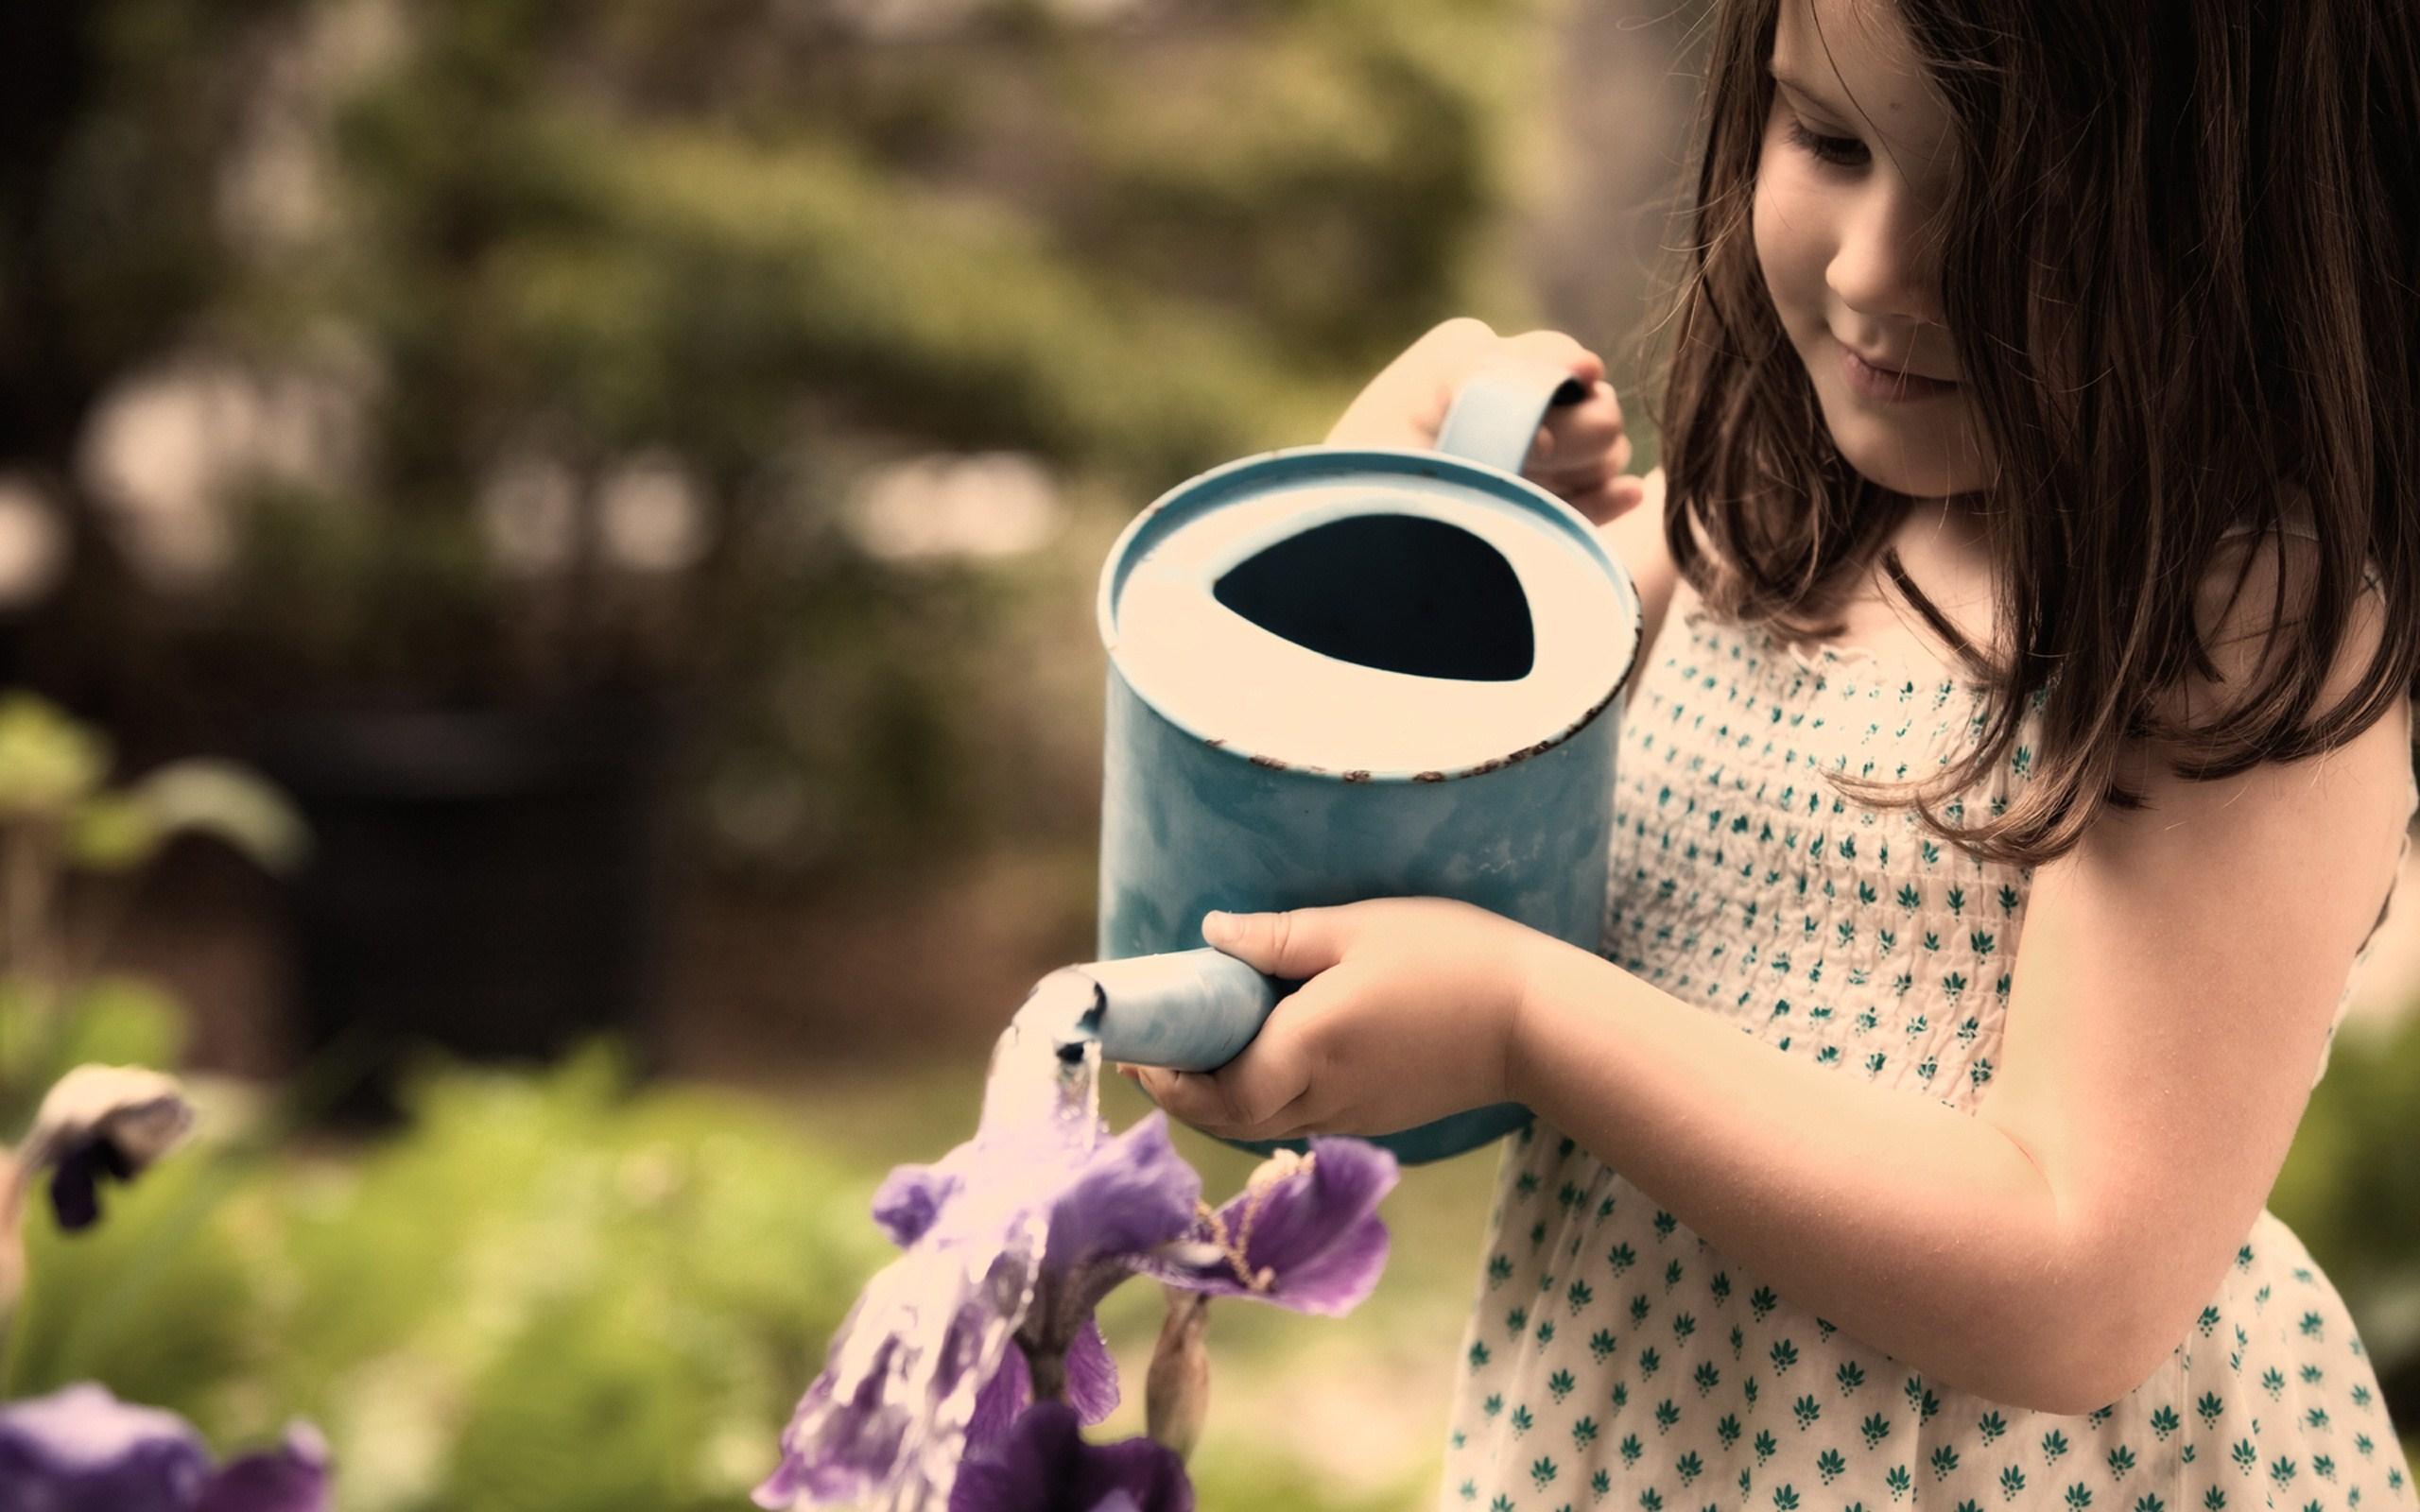 Beautiful-Kid-Girl-Watering-Flowers-Wallpaper-2975